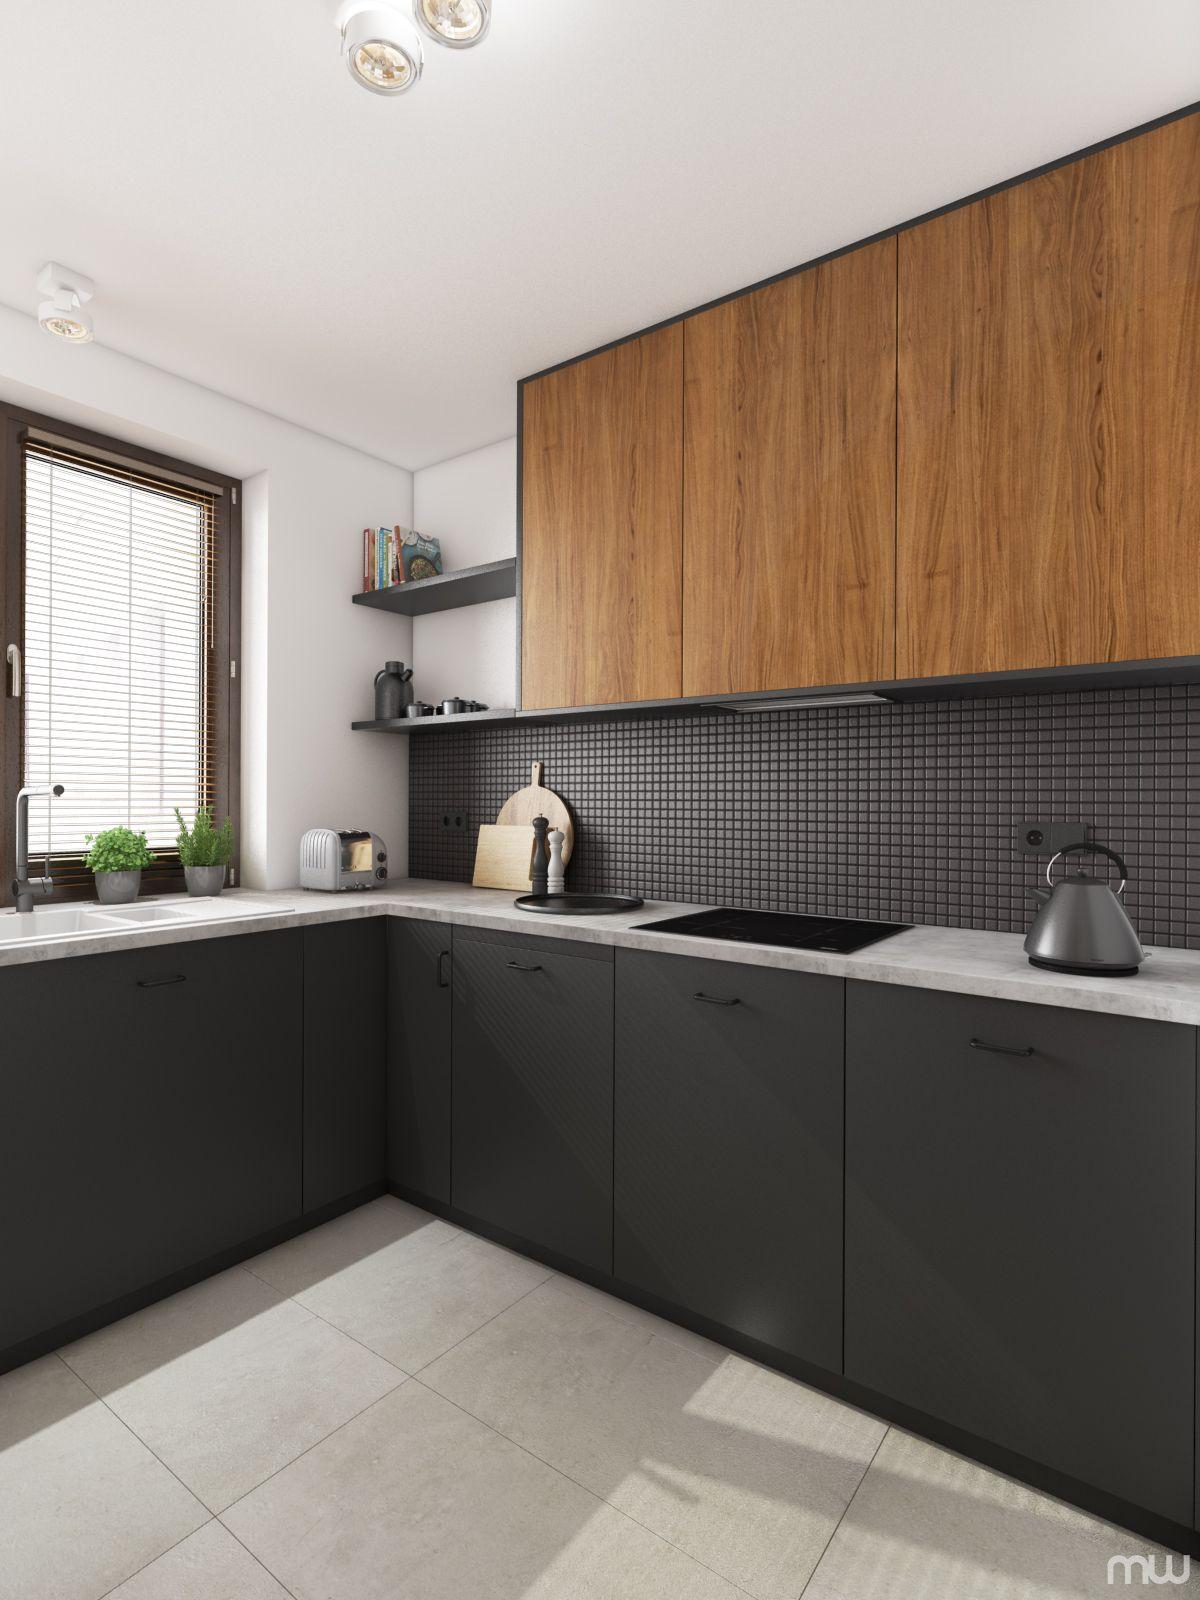 Pin By Joa Ka On Decoracao Industrial Simple Kitchen Design Minimalist Kitchen Design Home Decor Kitchen